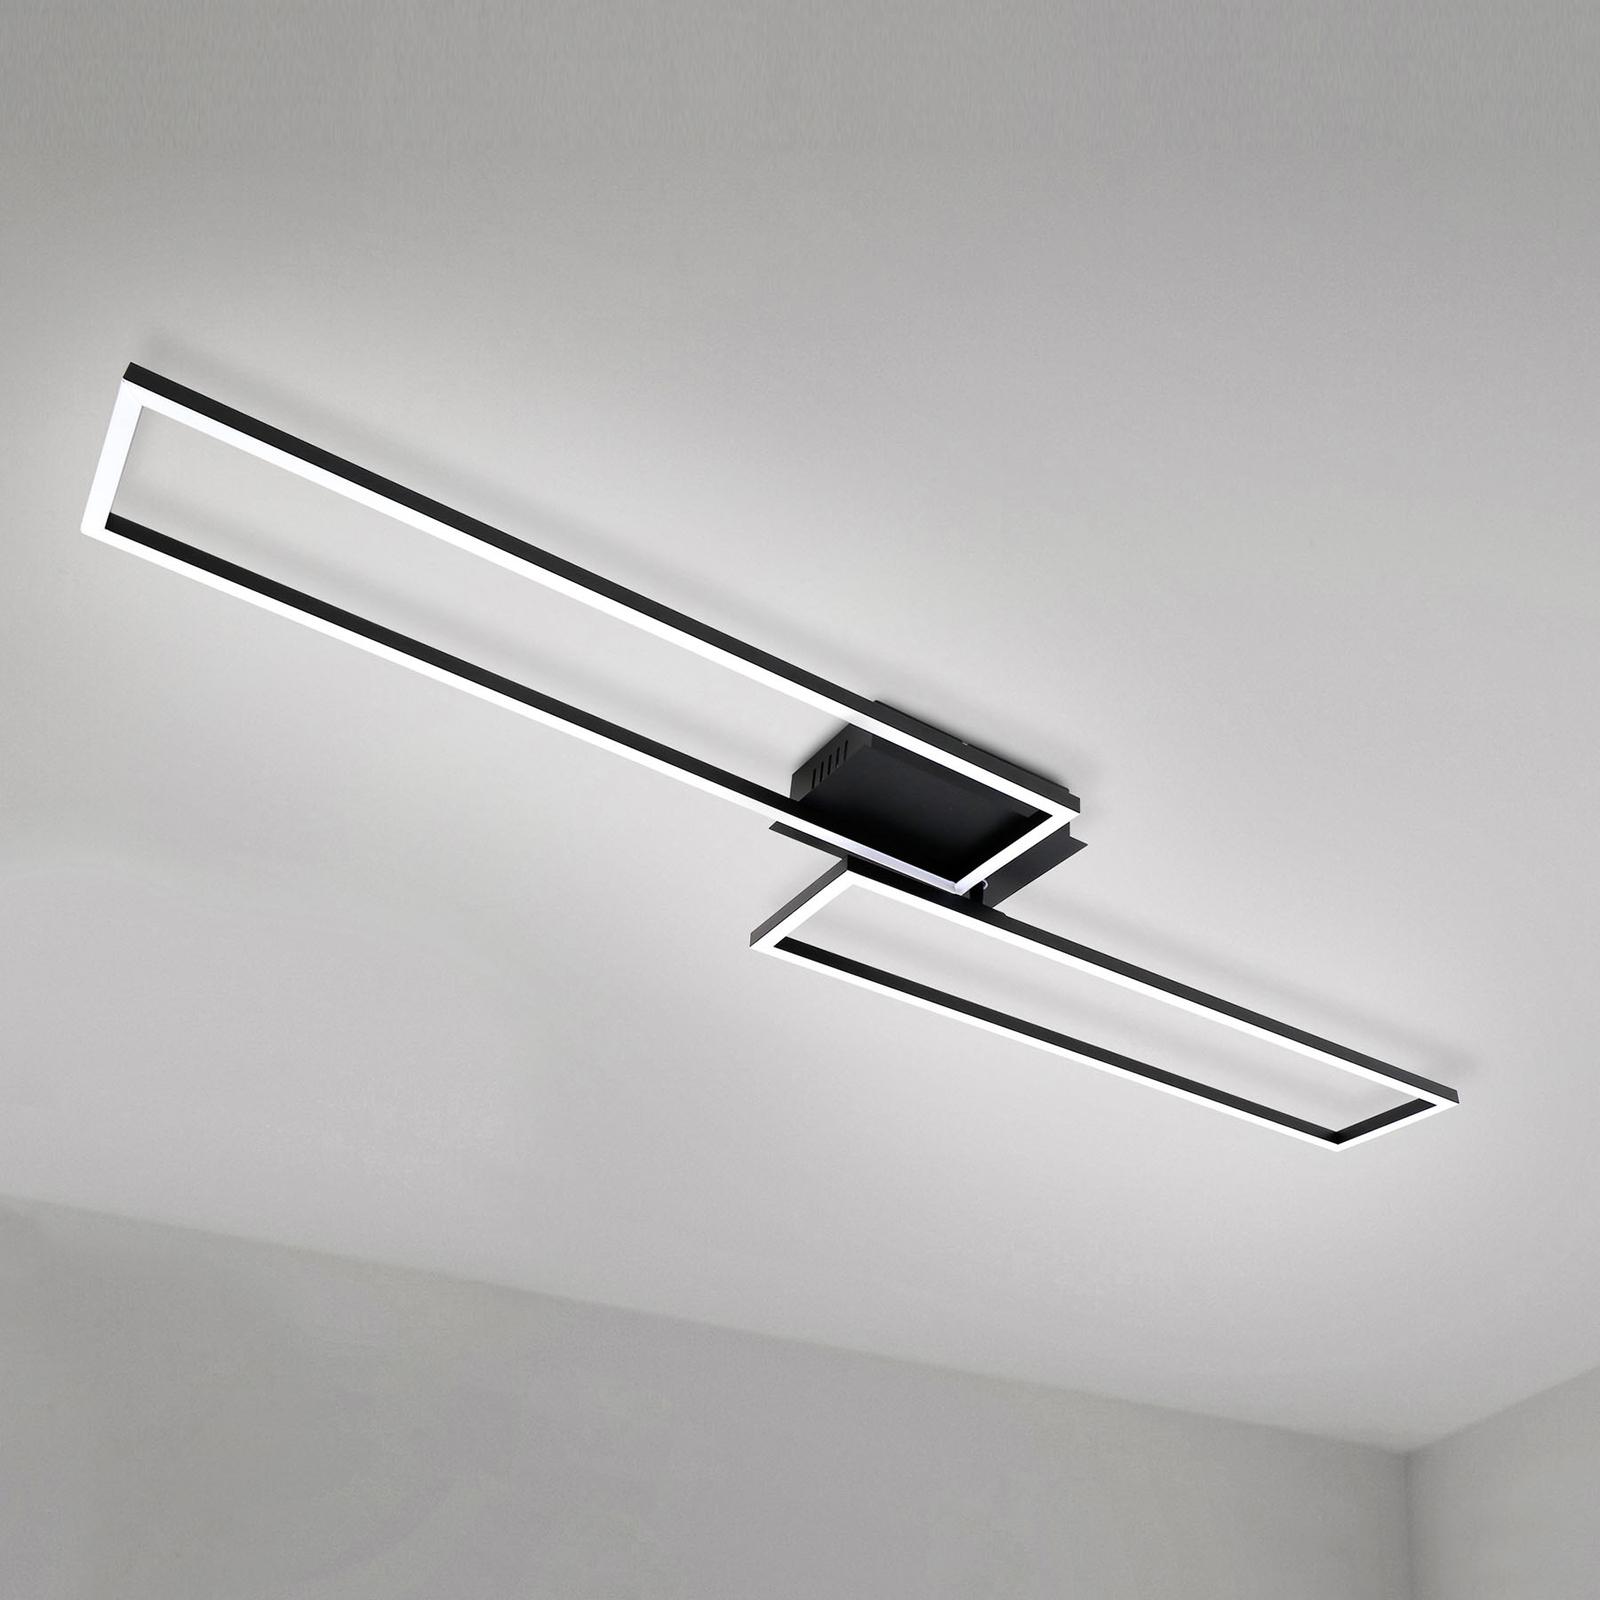 Plafonnier LED Frame, télécommande, noir